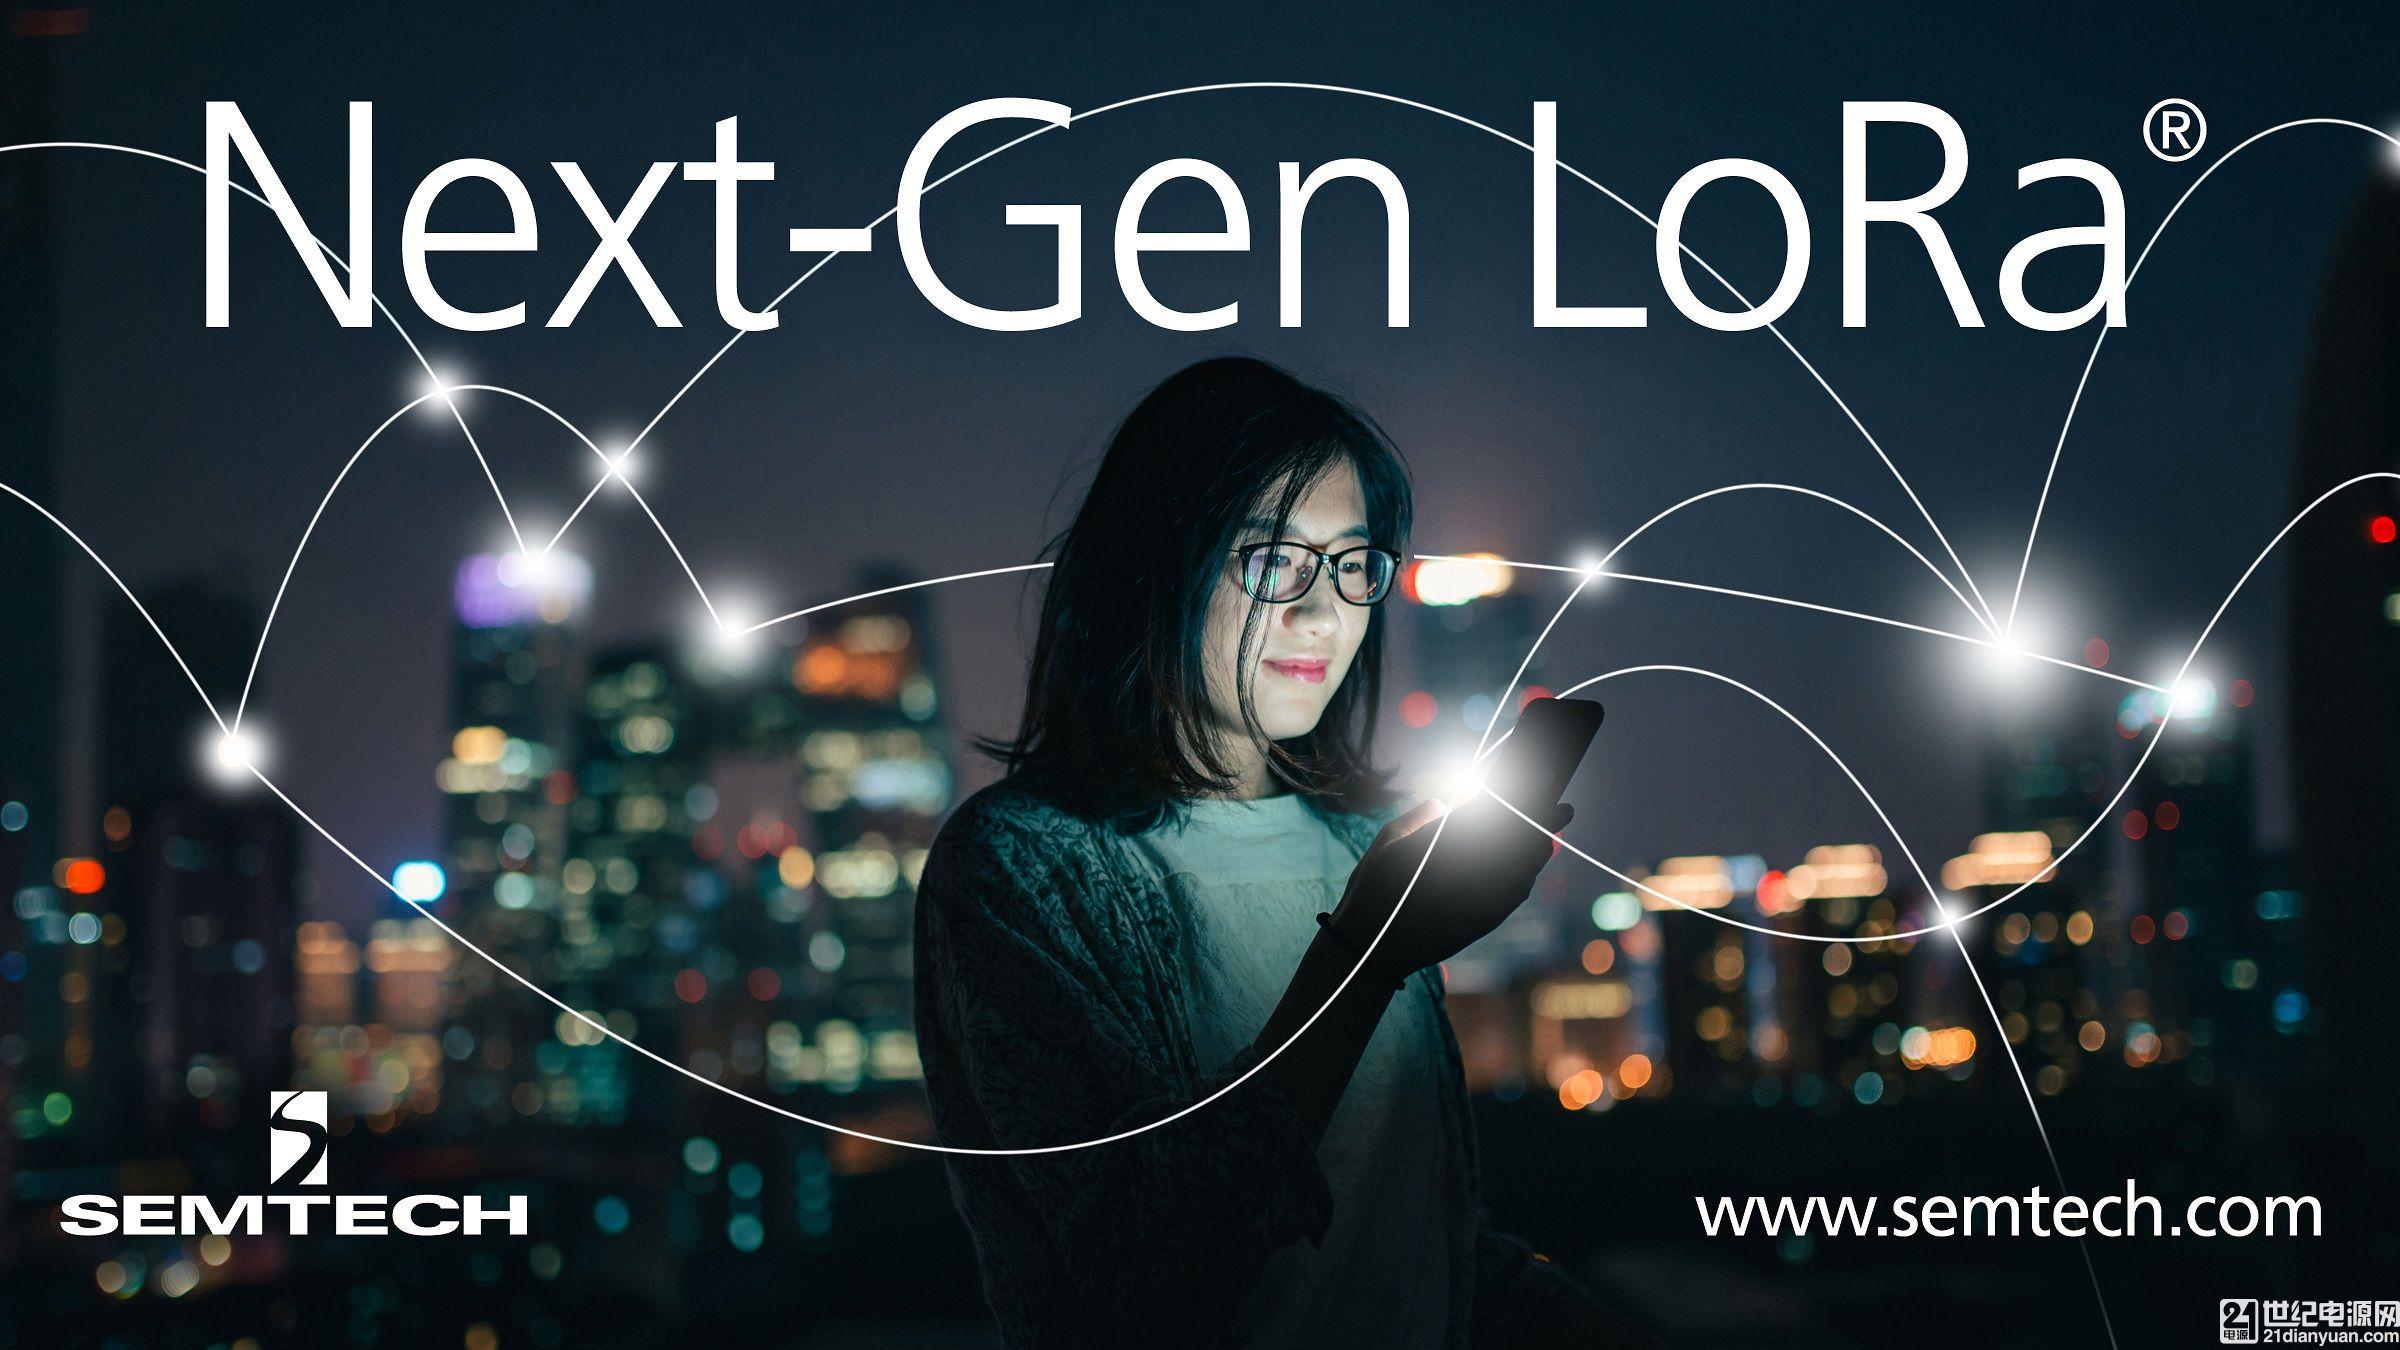 Semtech 以新一代 LoRa 平台支持物联网未来发展